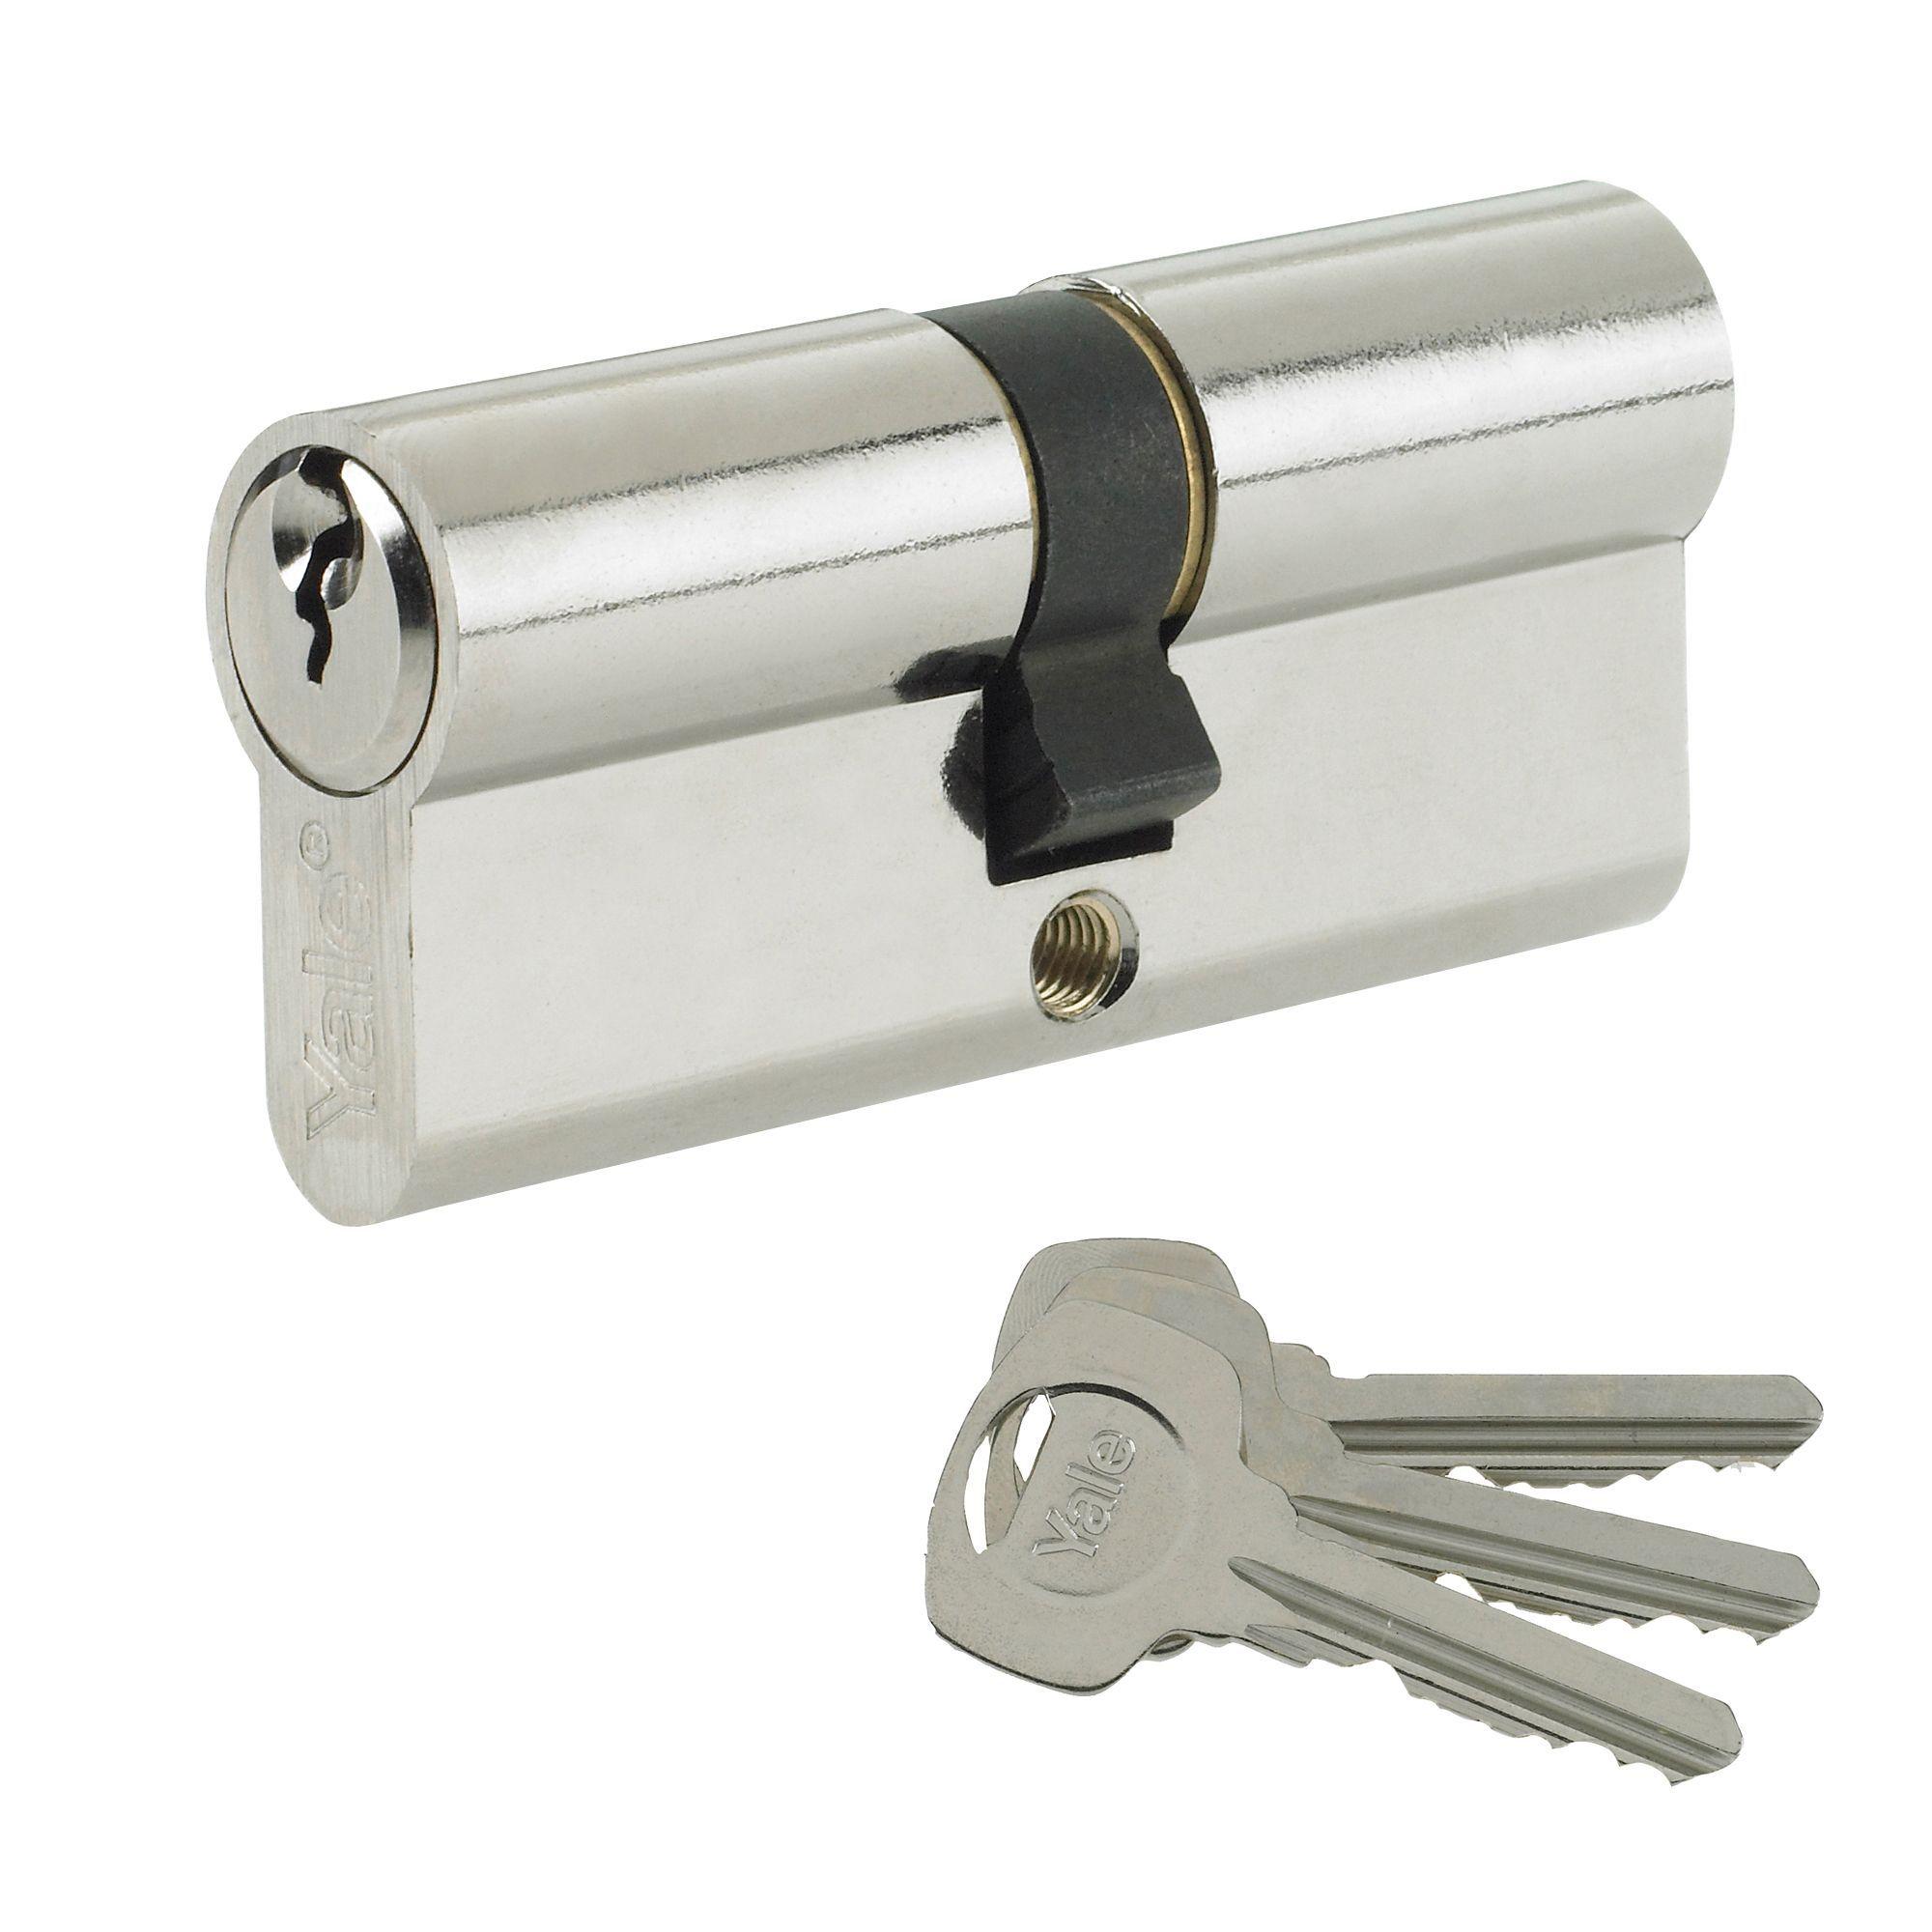 Yale 70mm Nickel-plated Euro Cylinder Lock